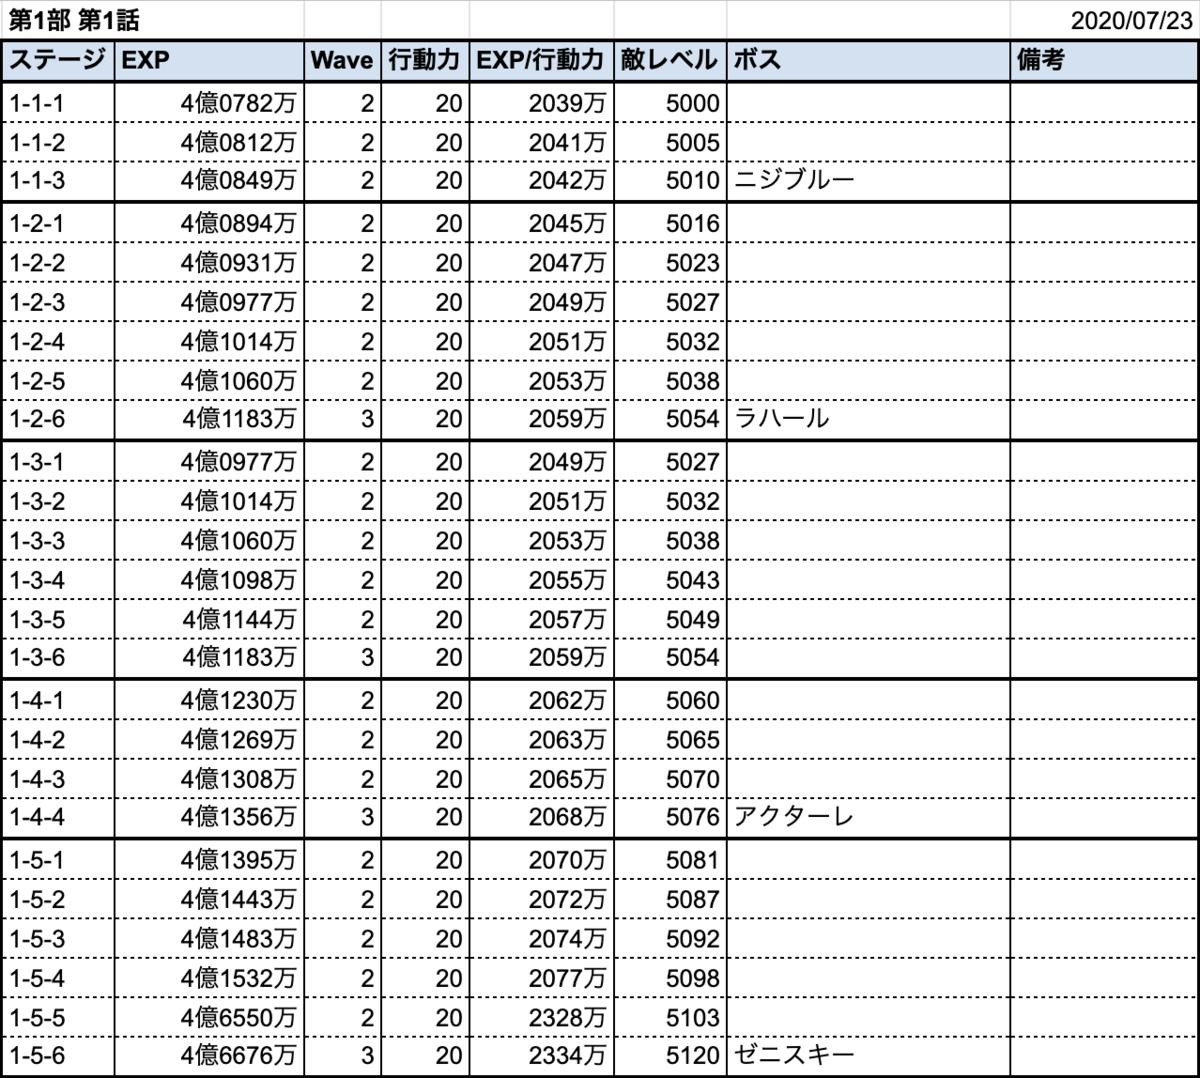 f:id:Yoshitaka-0922:20200723153829p:plain